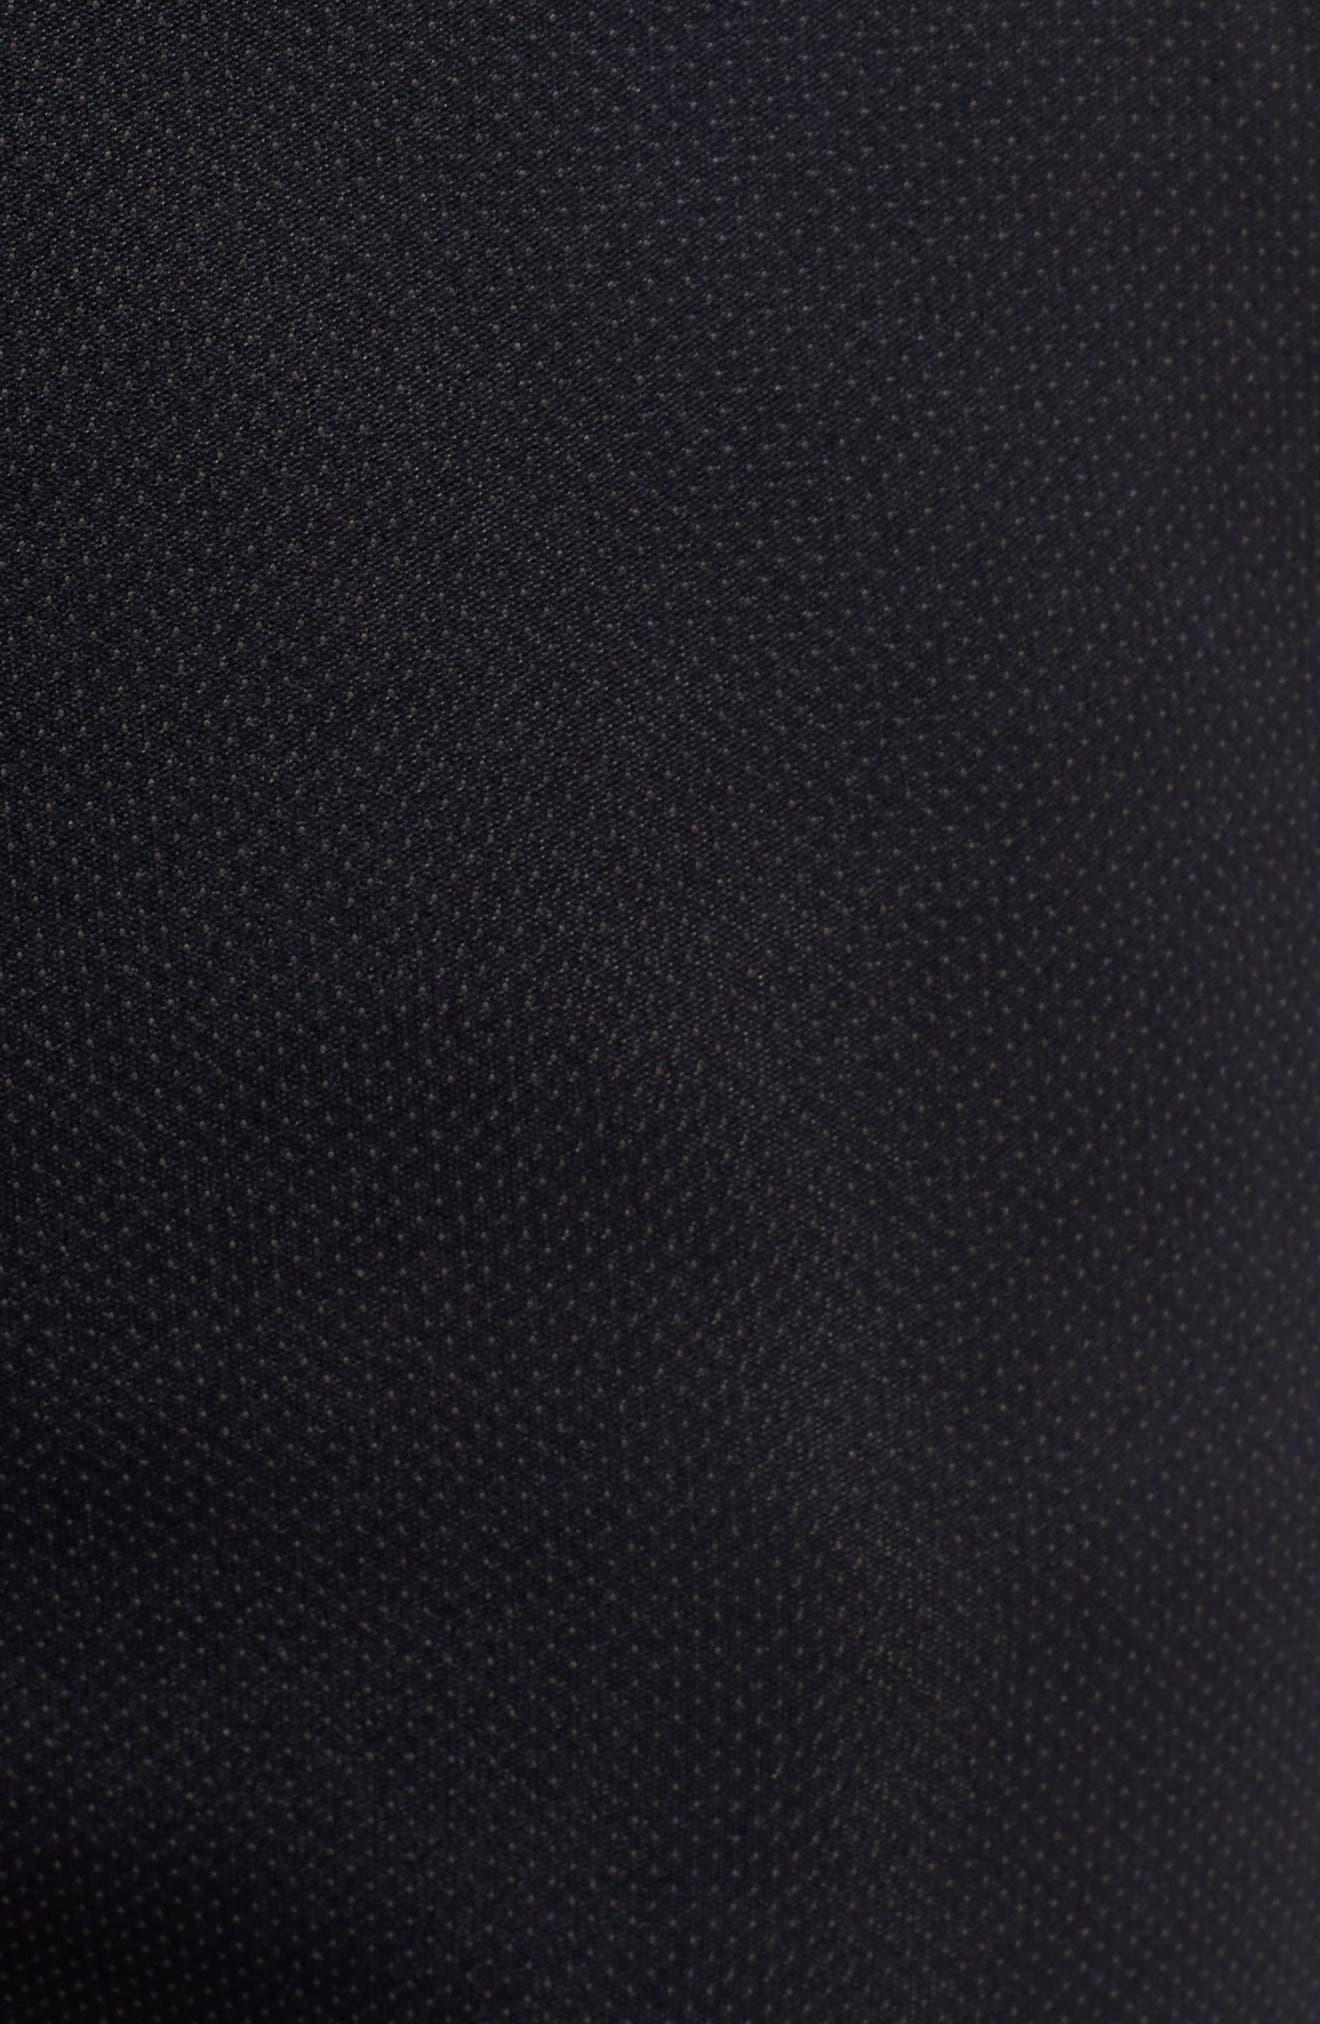 Unstoppable Move Airgap Pants,                             Alternate thumbnail 5, color,                             BLACK/ CHARCOAL/ BLACK